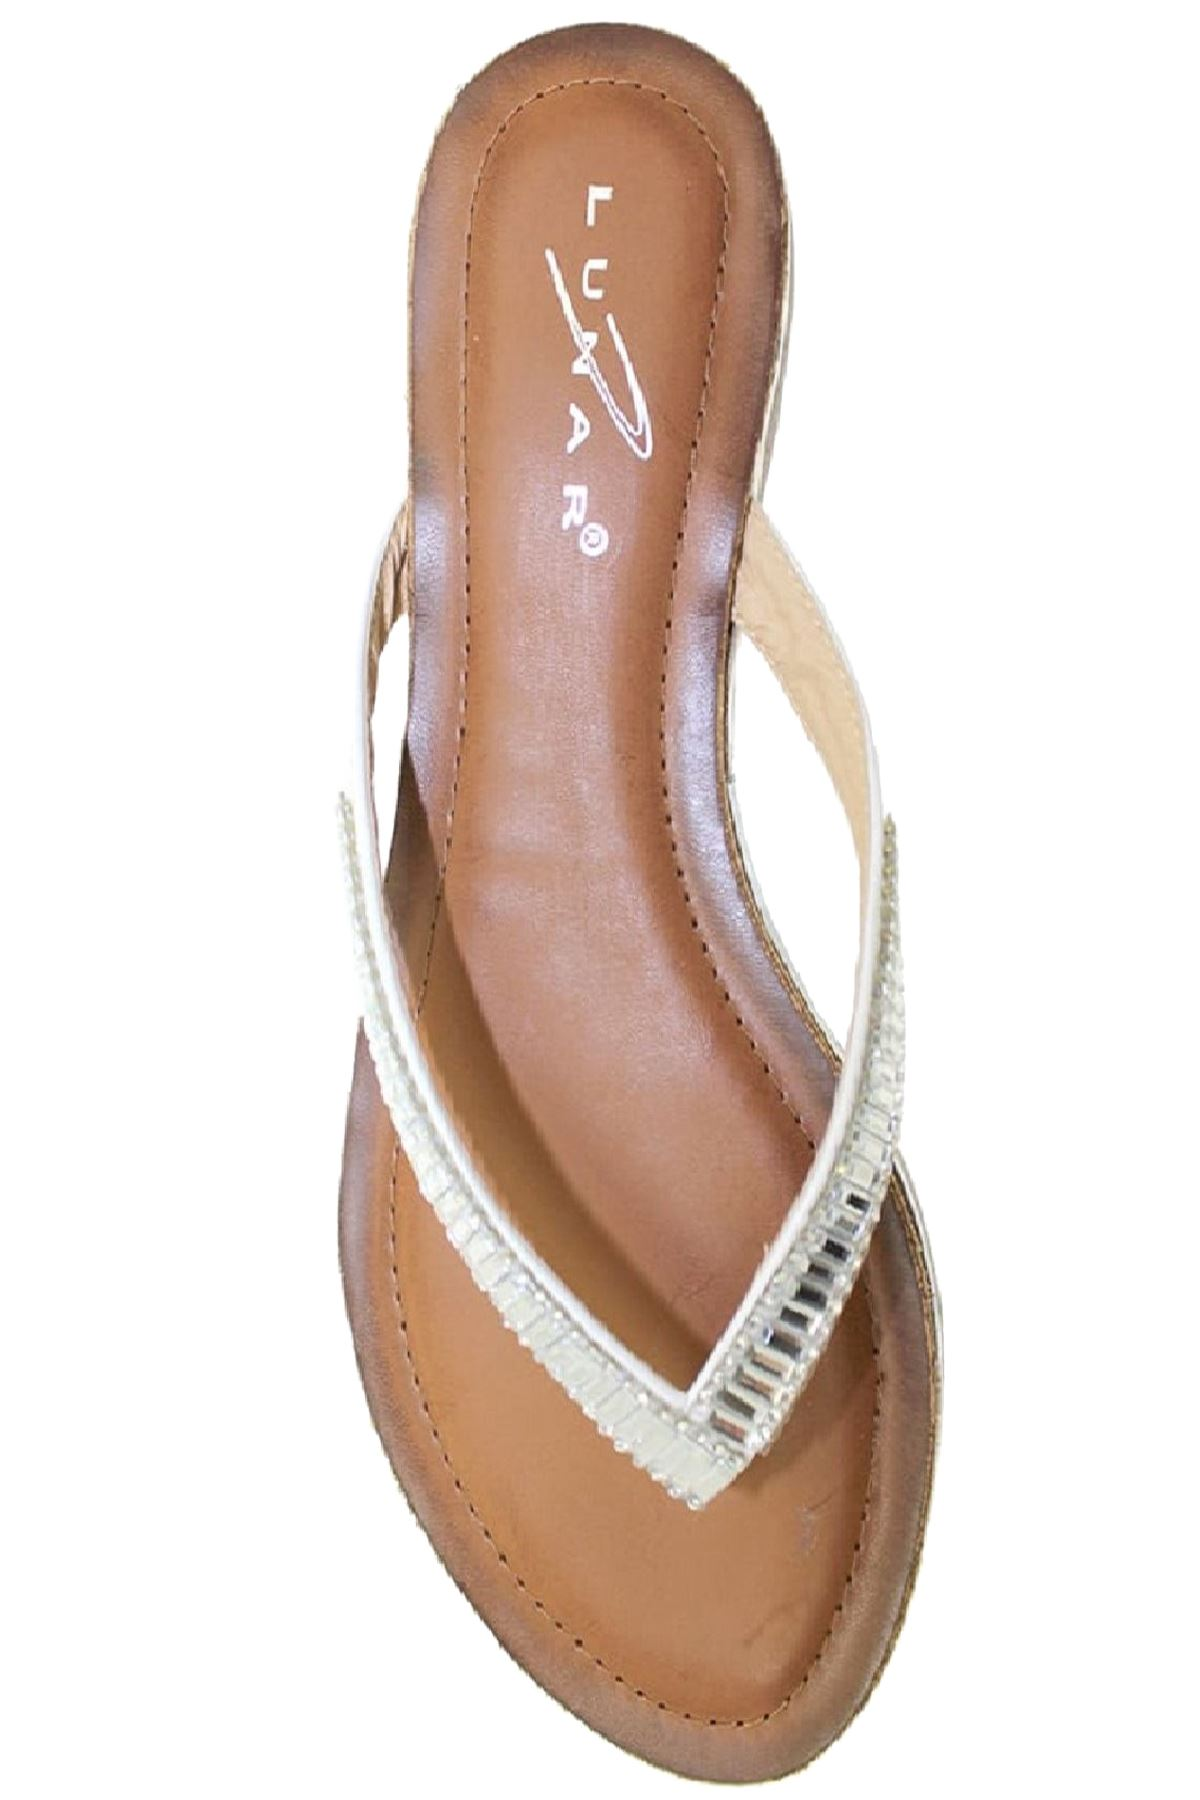 JLH812 Señoras Diamante cómodo Toe Post Starla Moda Sandalias Planas